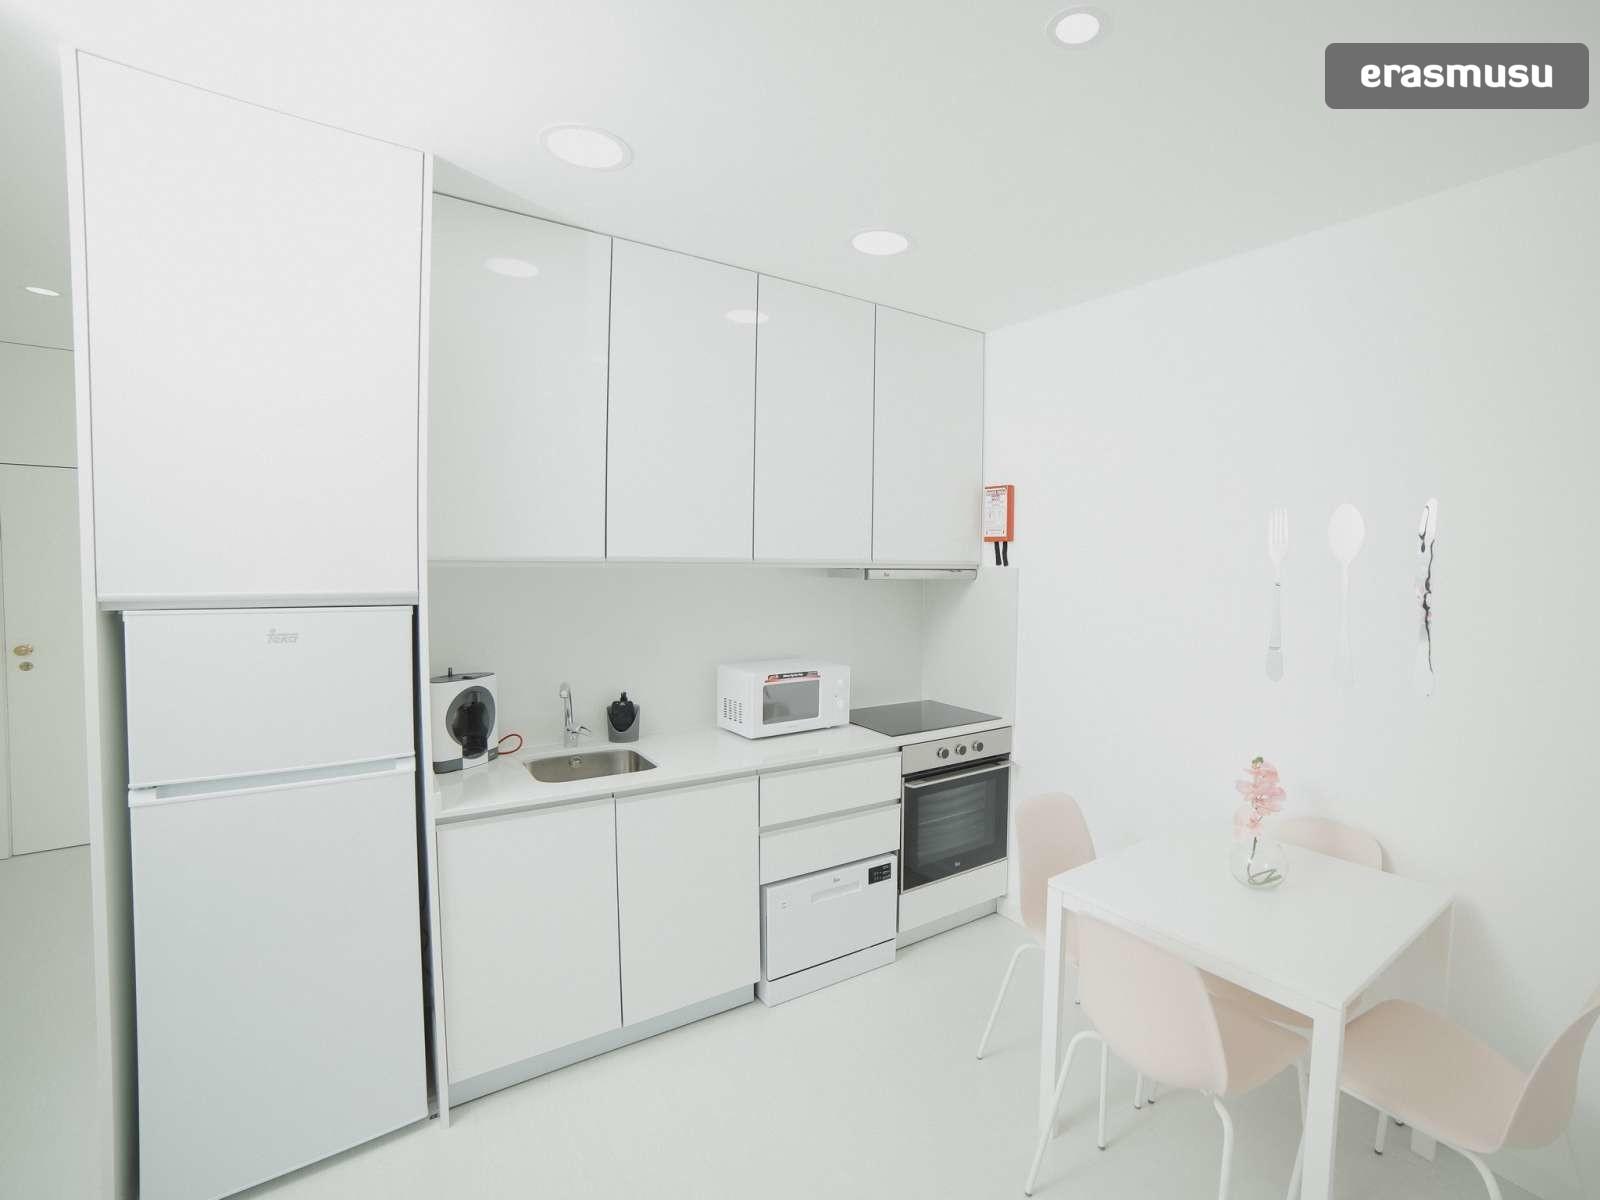 bright-studio-rent-santo-ildefonso-porto-4b53f53acaec667b02e5fc1